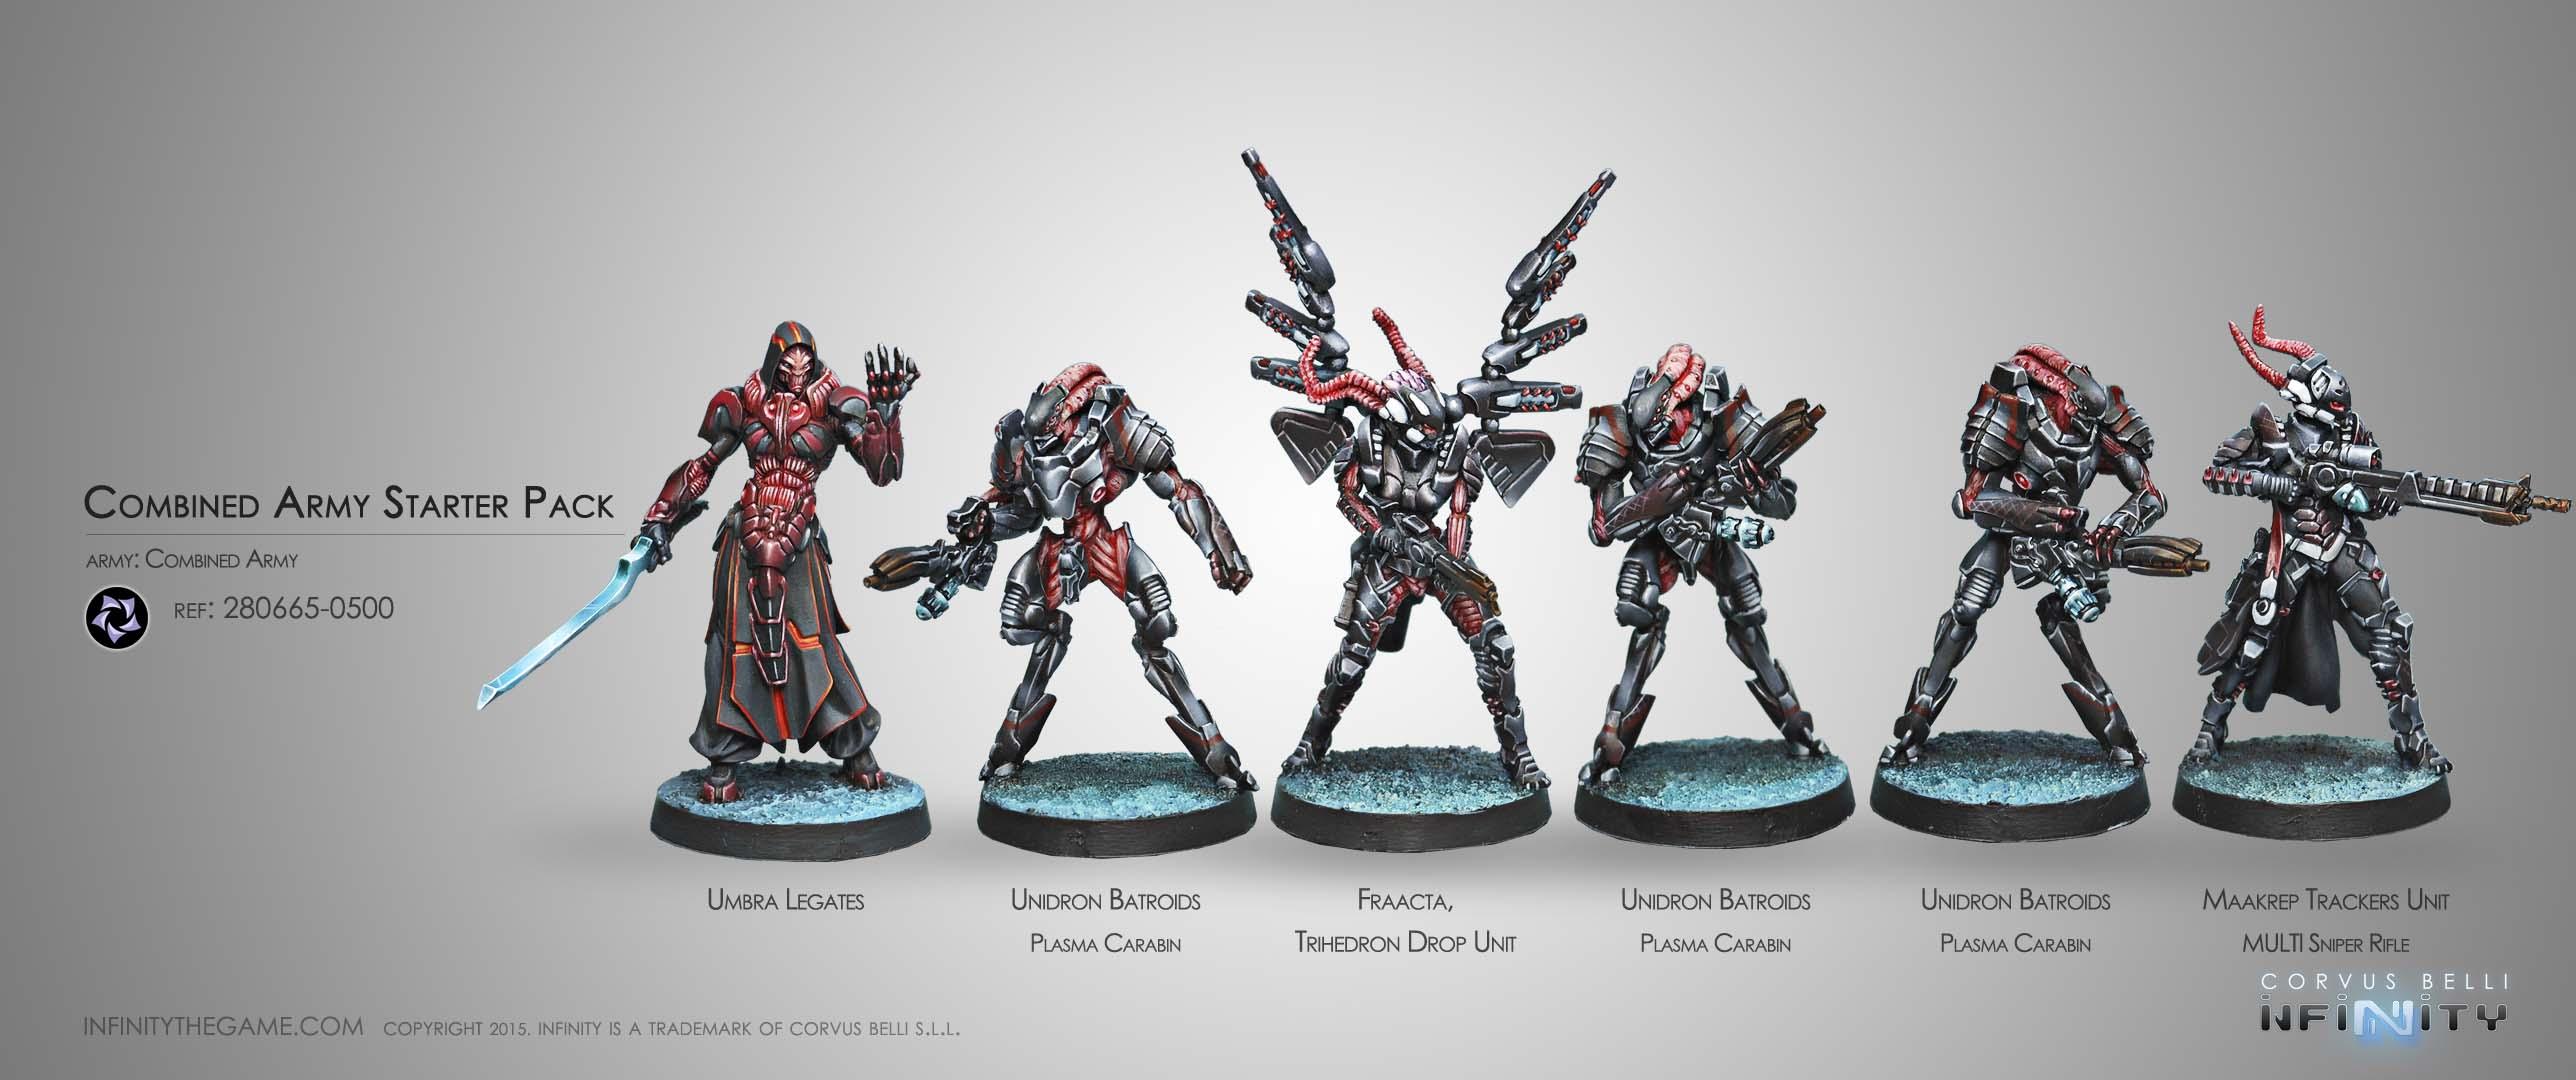 [Bild: 280665-0500-combined-army-starter-pack.jpg]